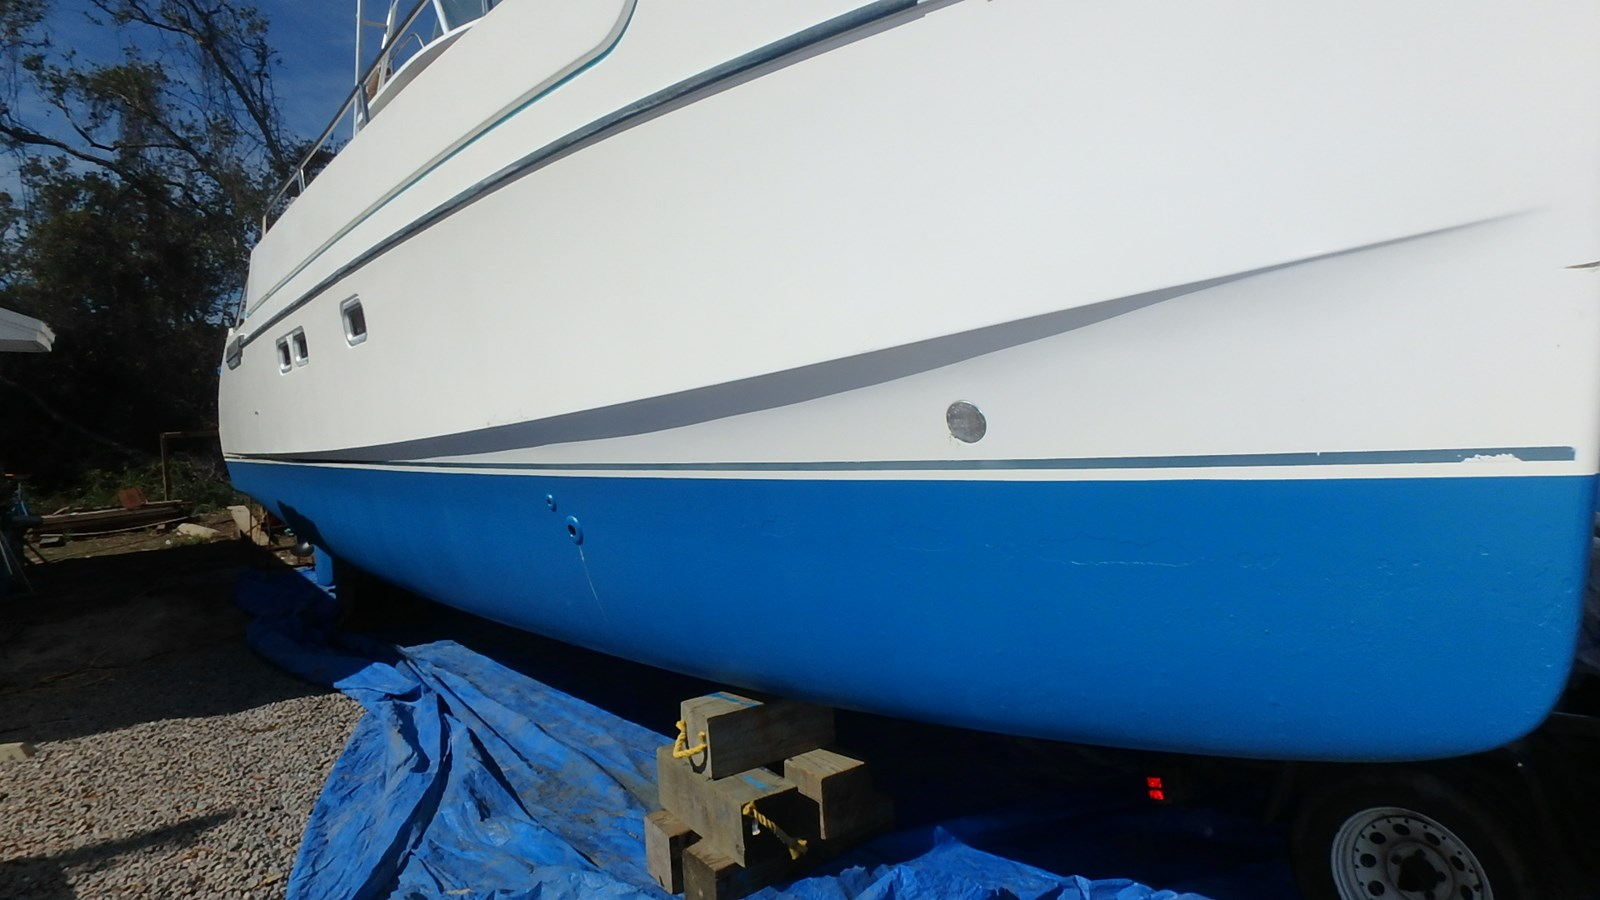 PA231425 2003 FOUNTAINE PAJOT 37 Maryland Catamaran 2760171